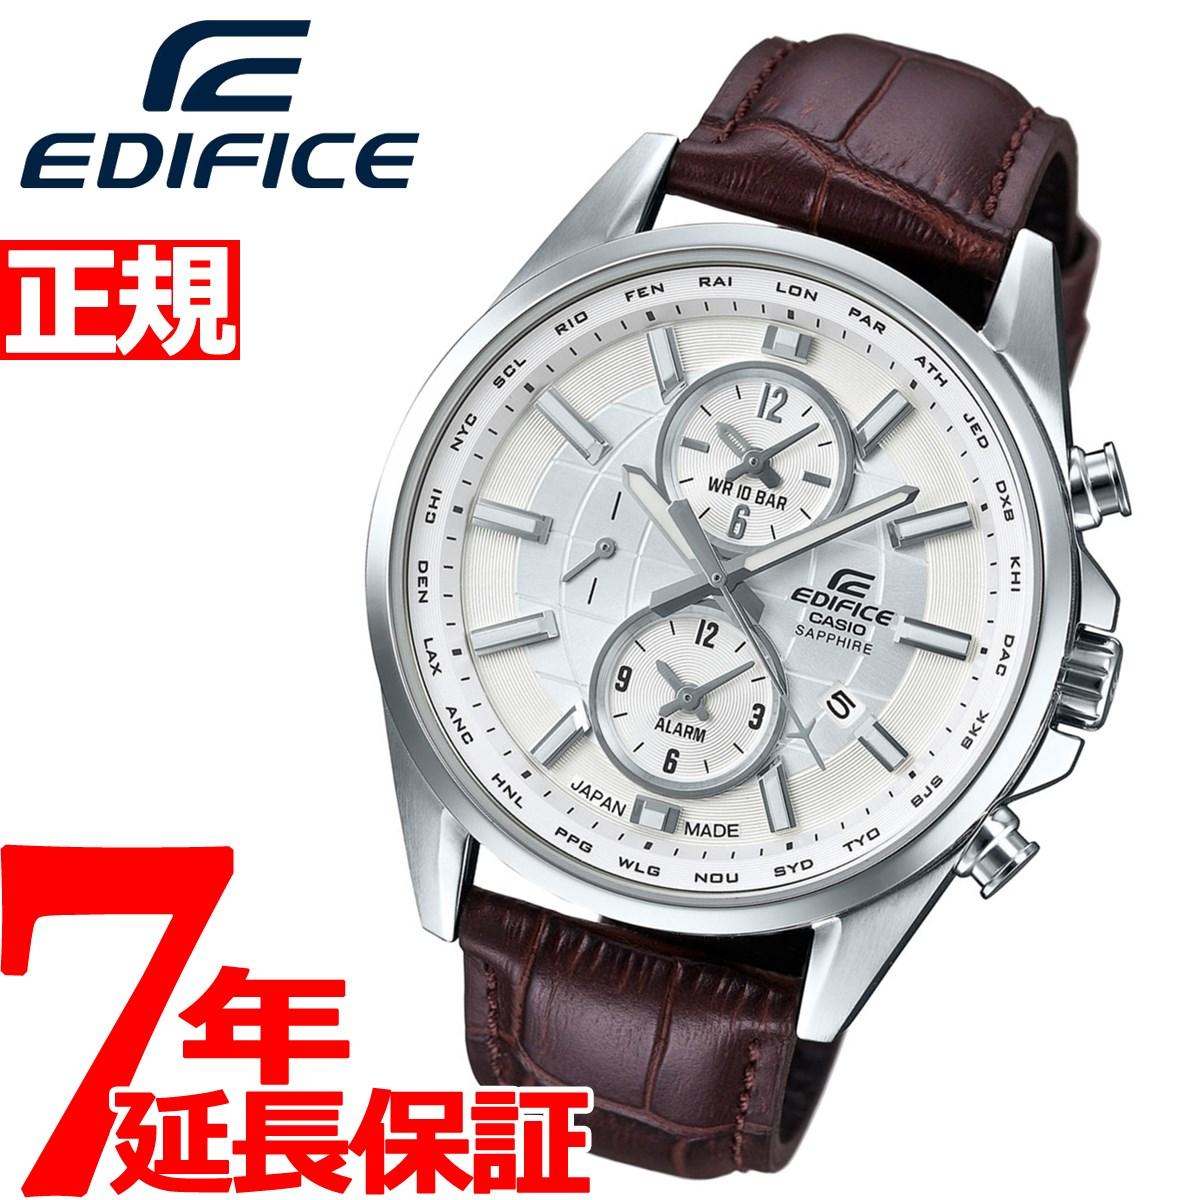 【SHOP OF THE YEAR 2018 受賞】カシオ エディフィス CASIO EDIFICE 限定モデル 腕時計 メンズ アナログ EFB-302JL-7AJF